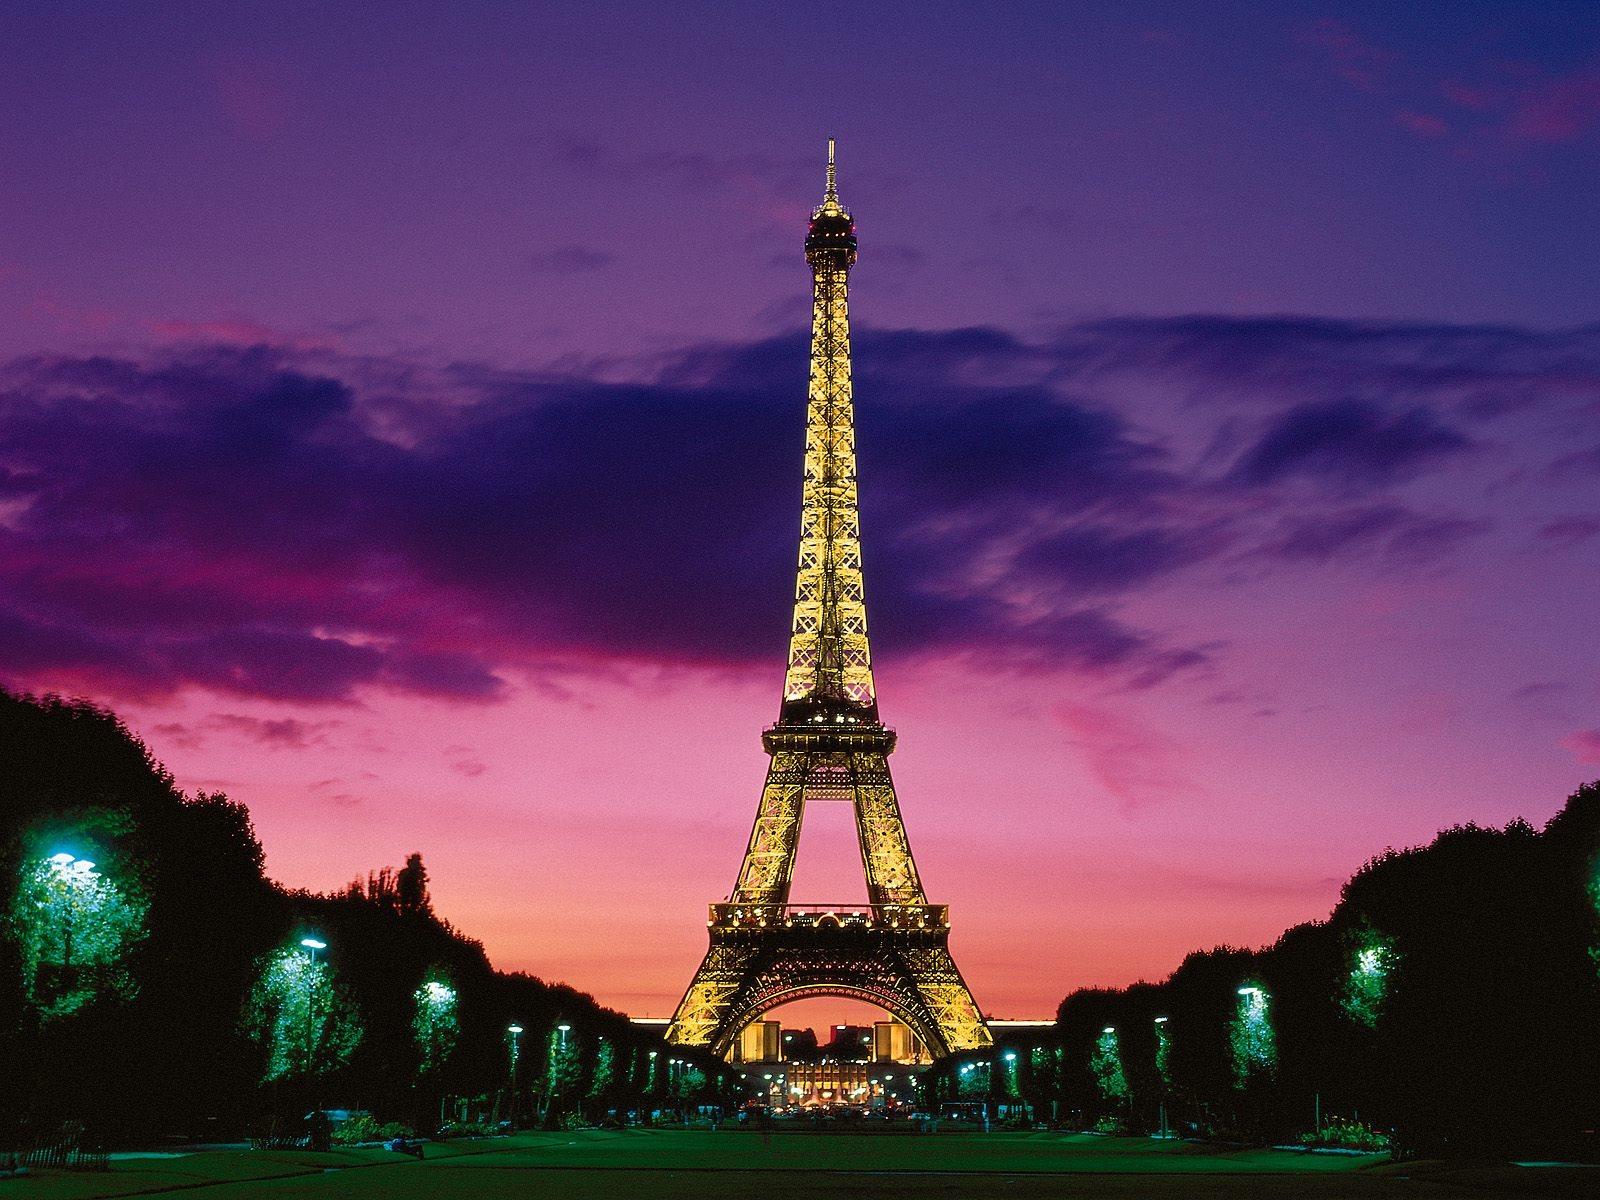 Eiffel Tower At Night Paris France Wallpaper 1600x1200